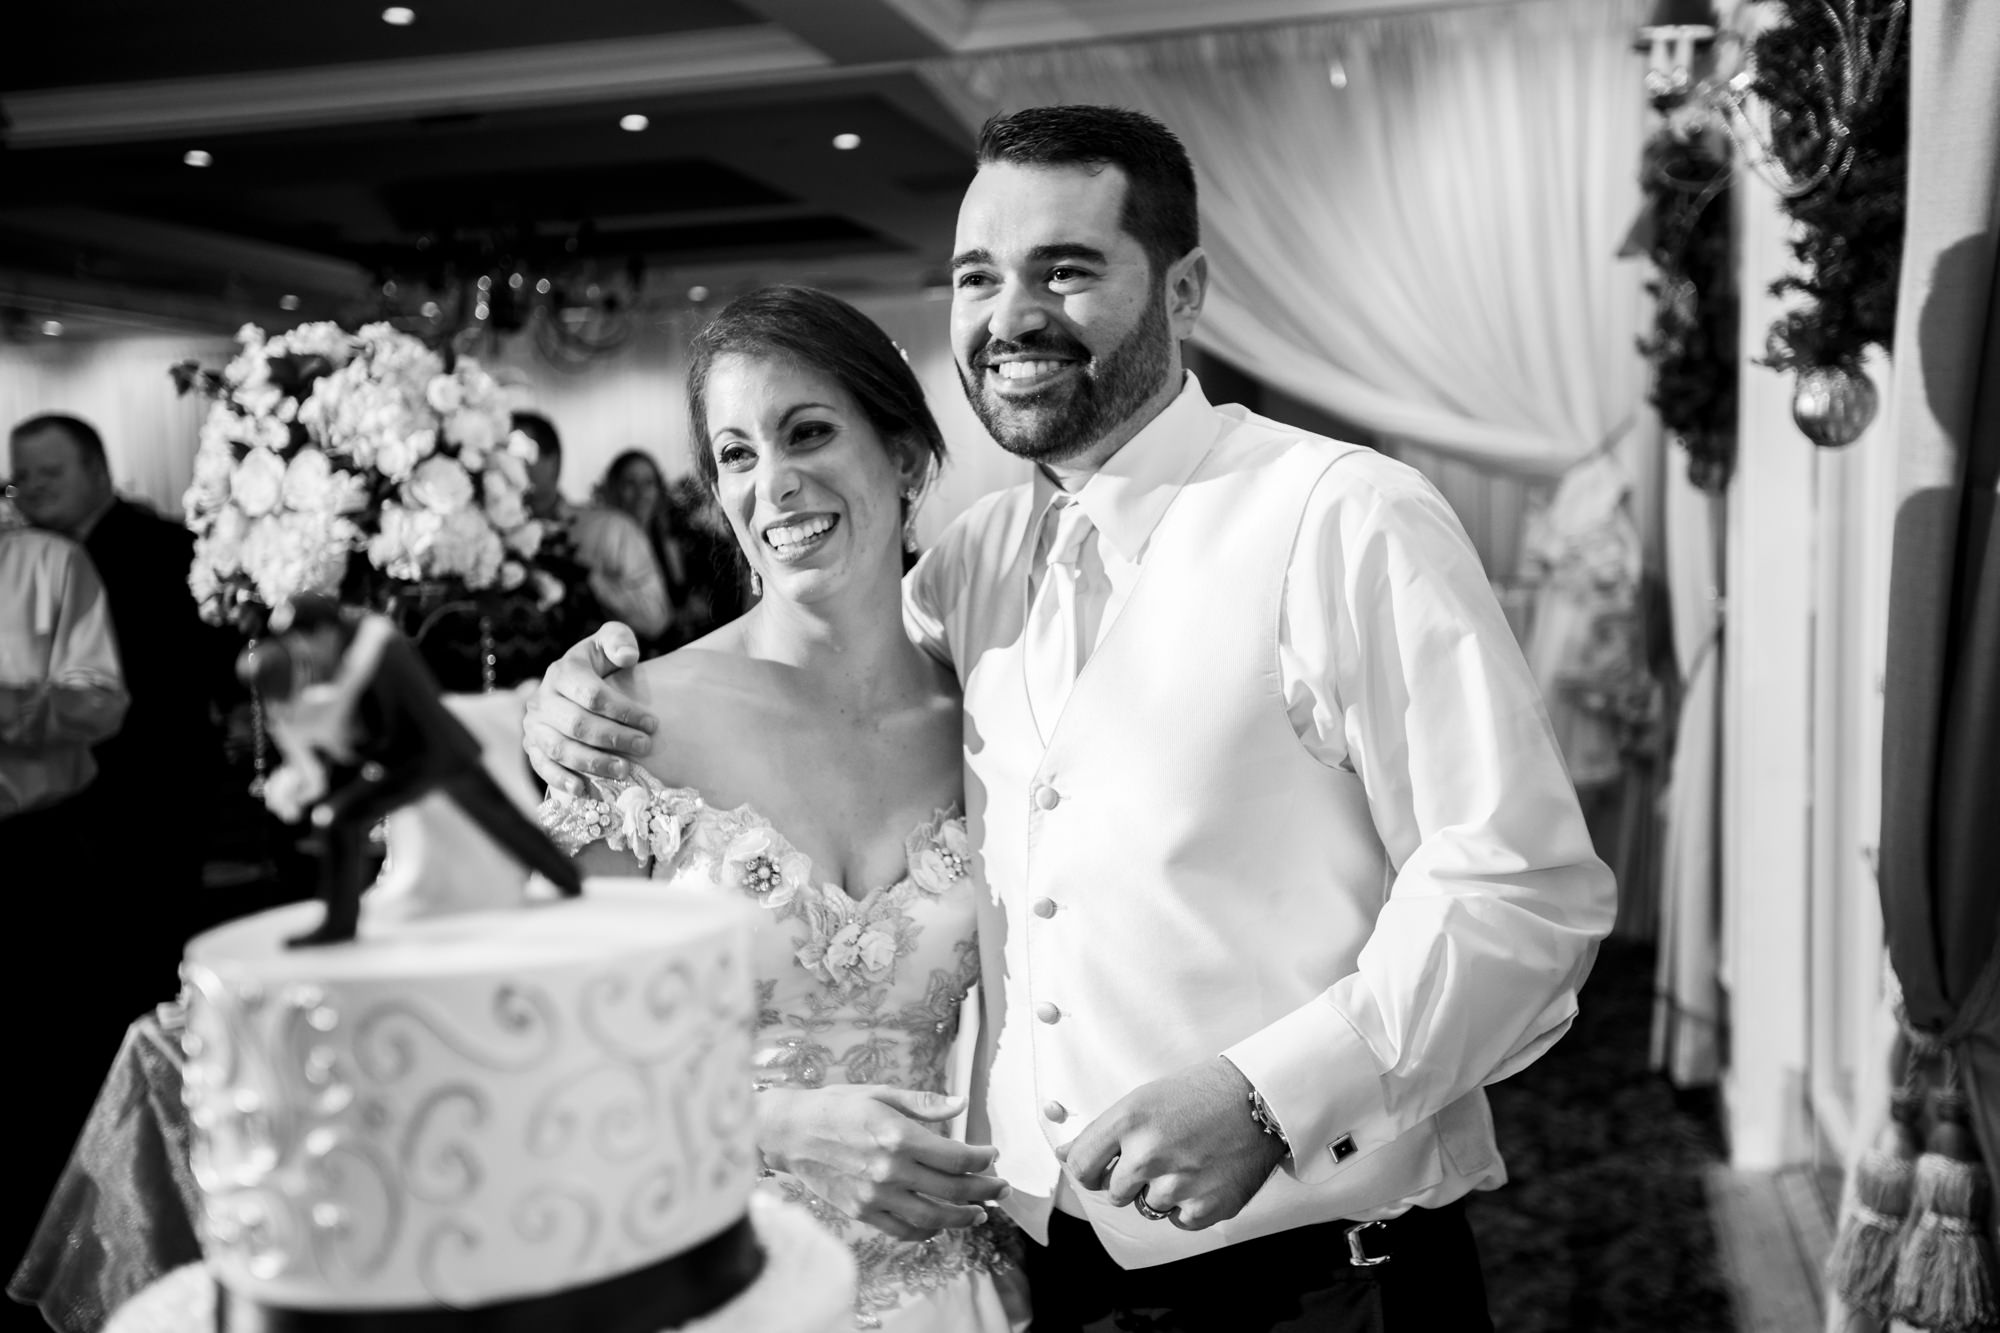 Benvenuto_Wedding_catholic_Florida_Bride-Groom-139.jpg